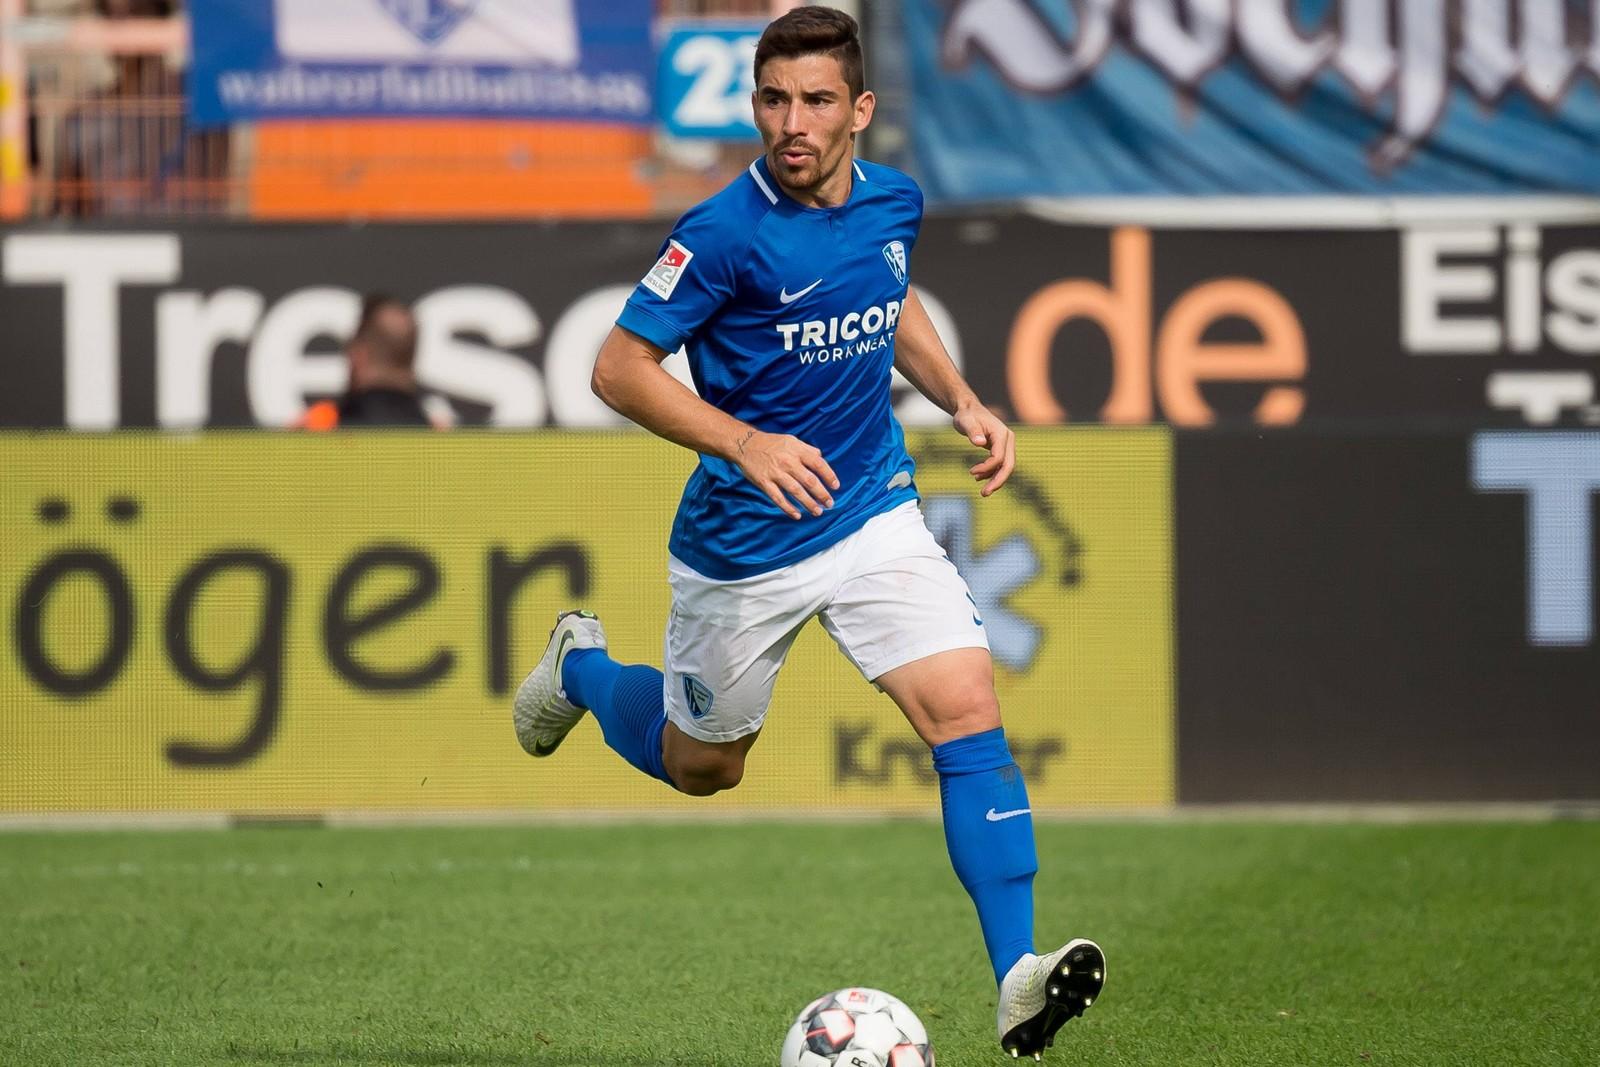 Danilo Soares am Ball für den VfL Bochum